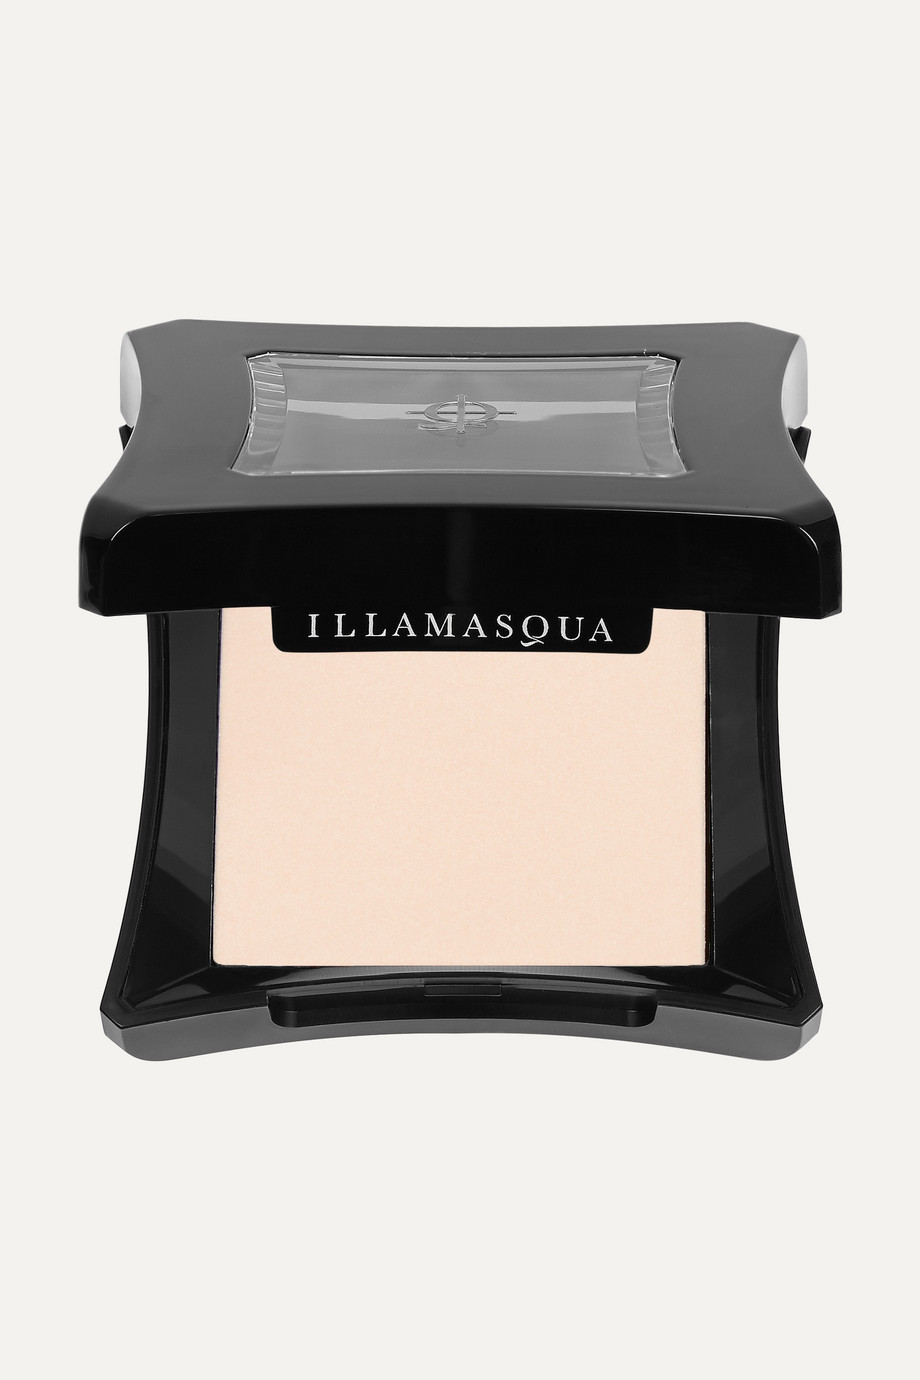 Illamasqua Gleam – Aurora – Highlighter